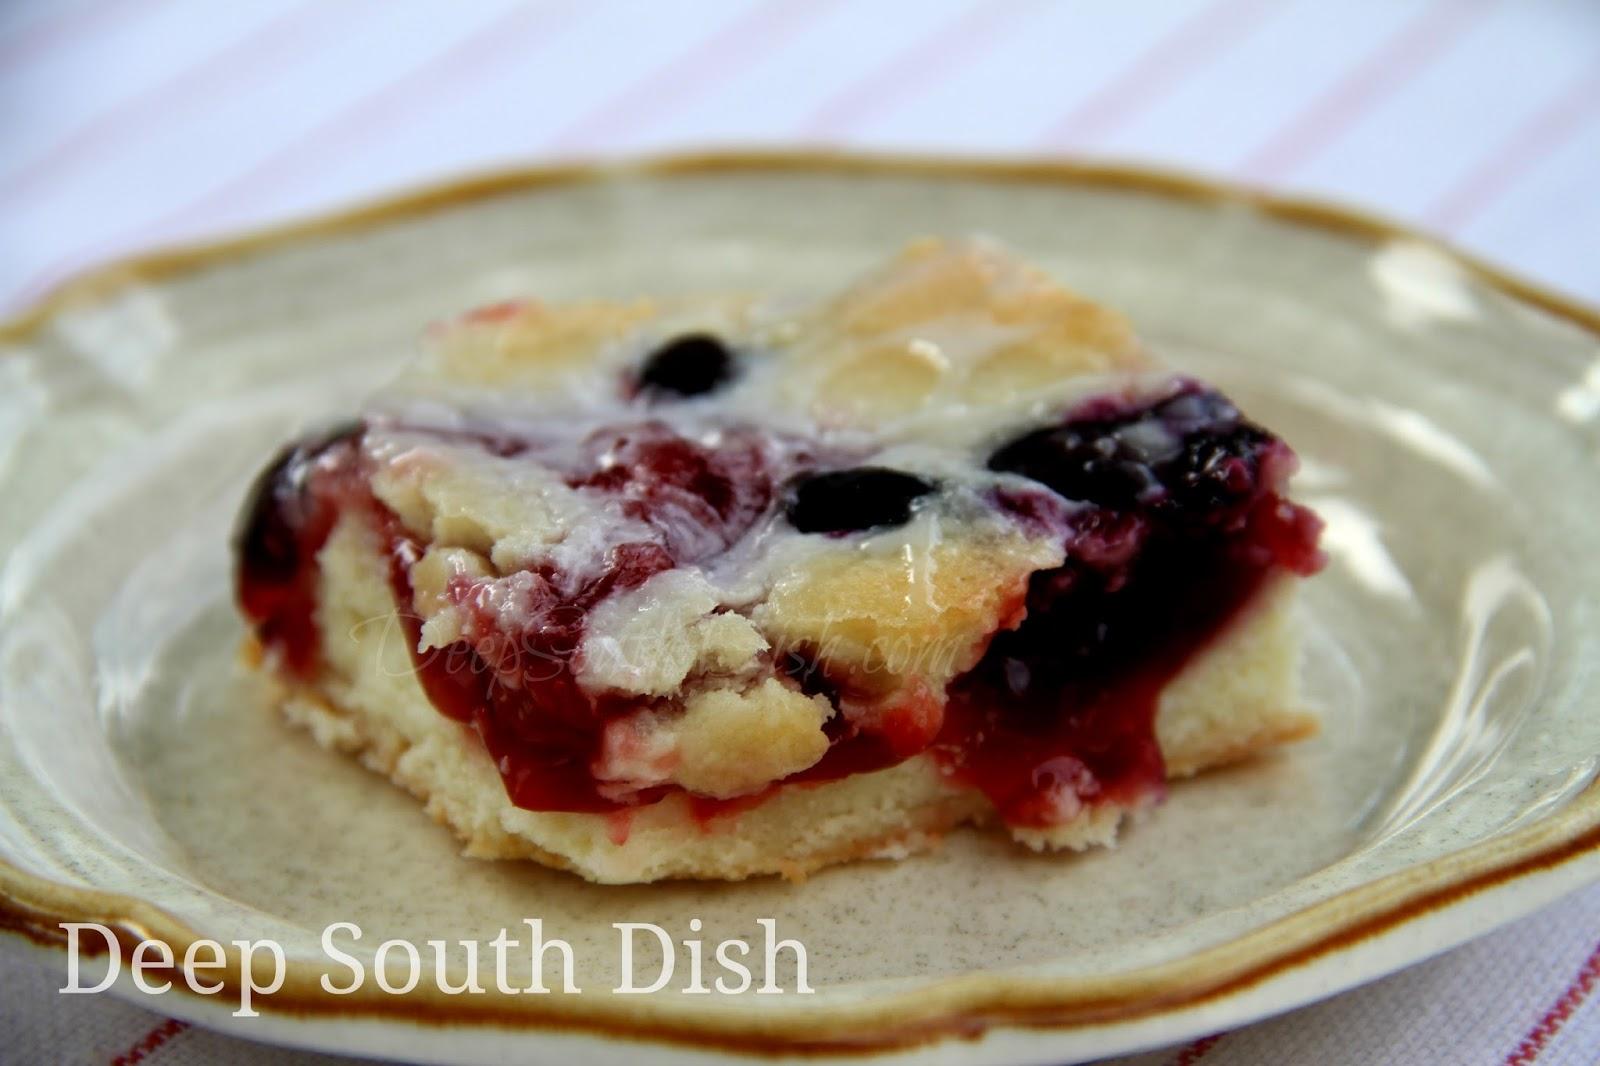 Deep South Dish: Cherry Pie Bars